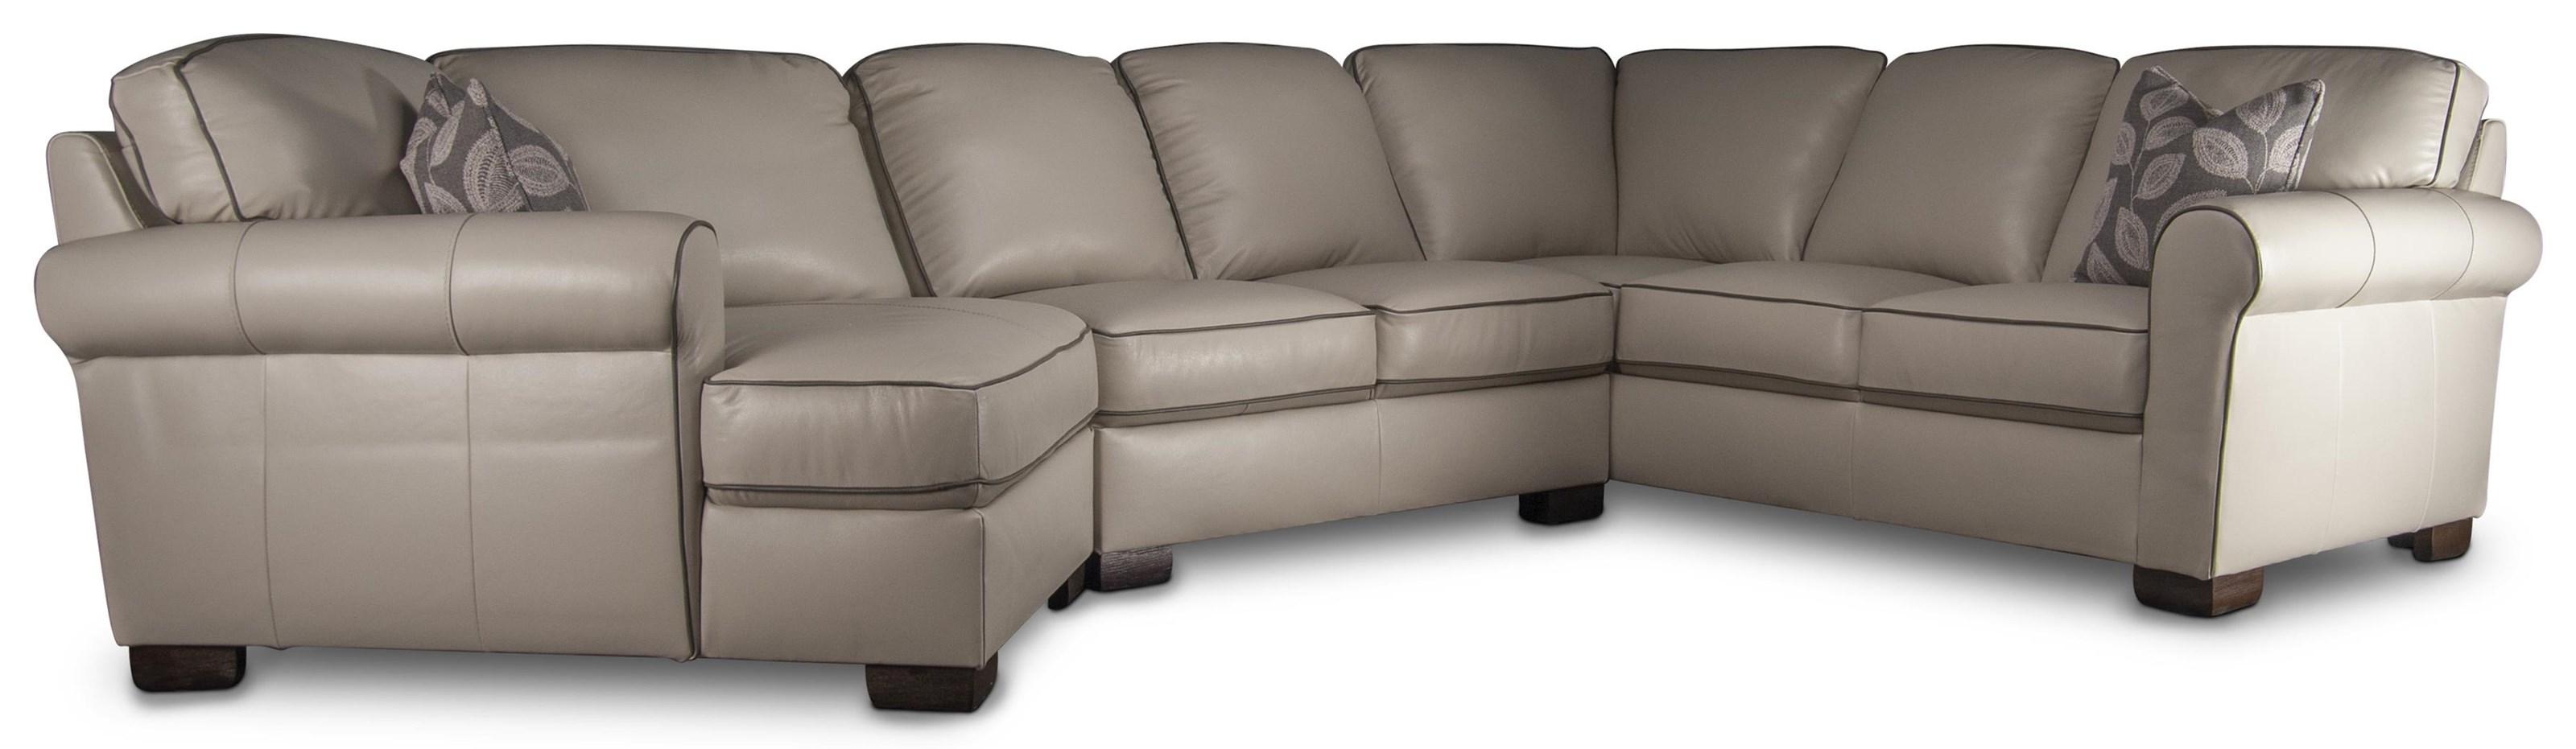 Laramie Laramie 100% Leather Sectional Sofa by Kuka Home at Morris Home